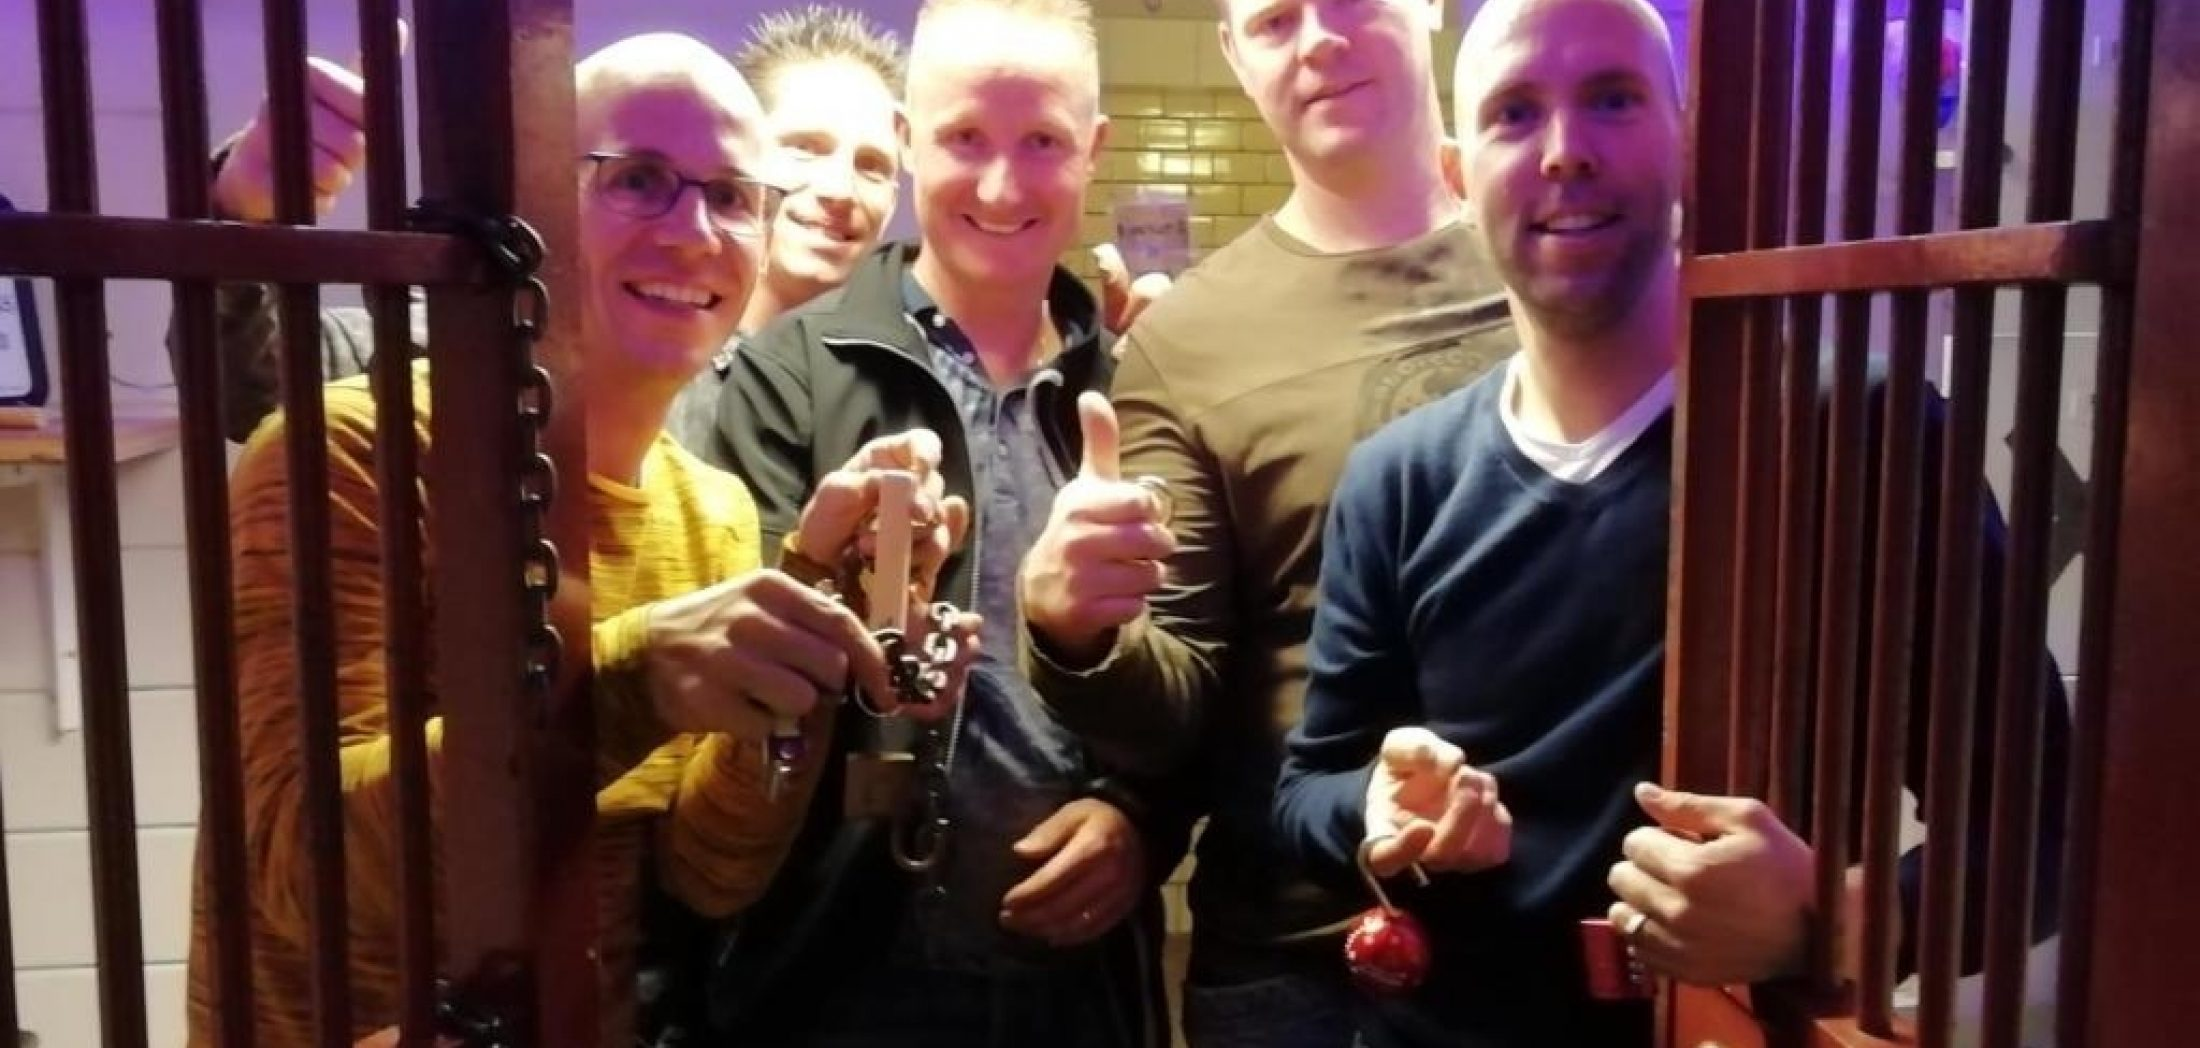 Hero image for Zwolle event 1 dag: collega's 25/75 personen